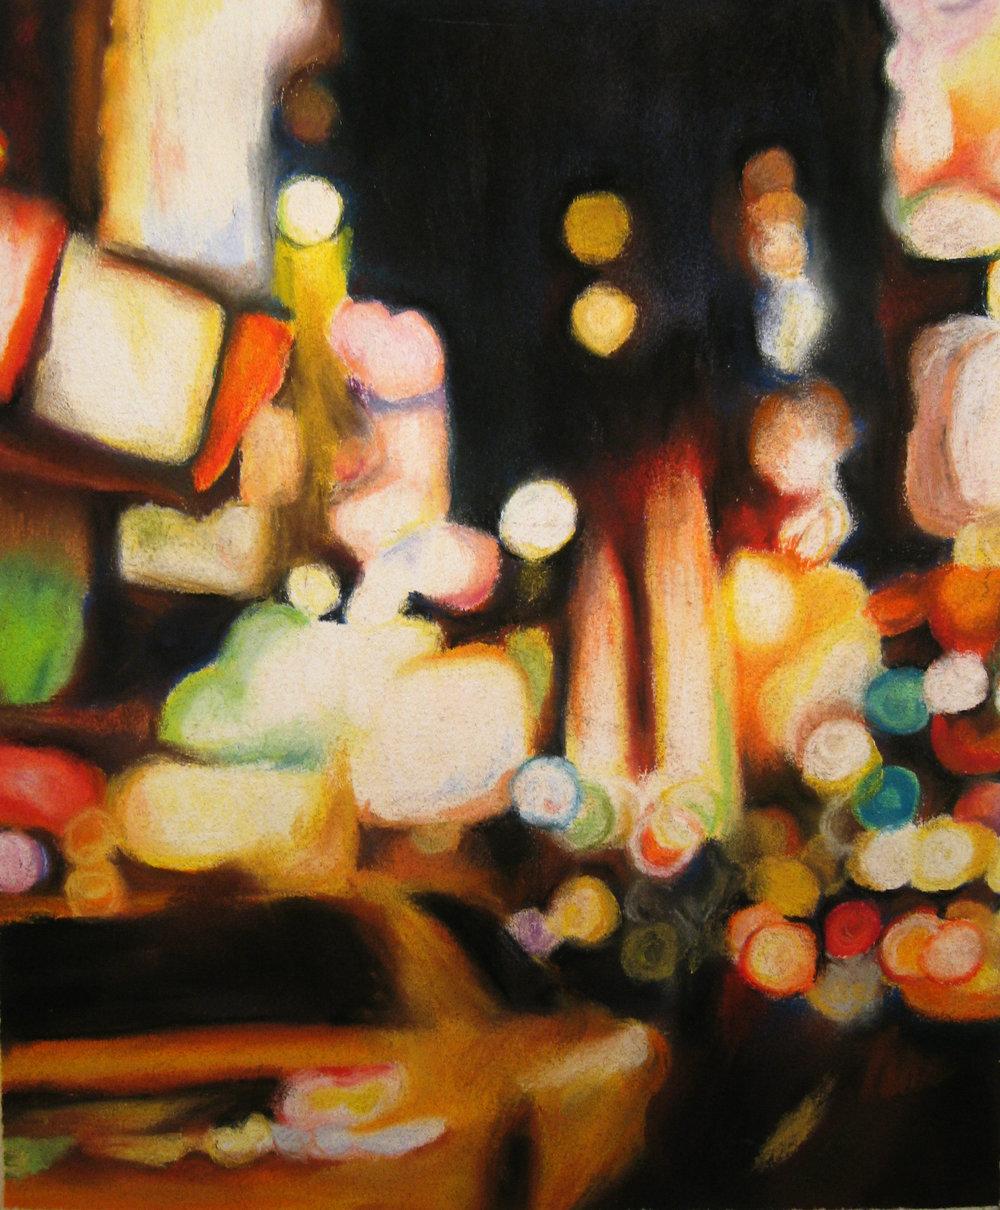 urban symphony series-Steel and Lights - trogoschewsky1.jpg